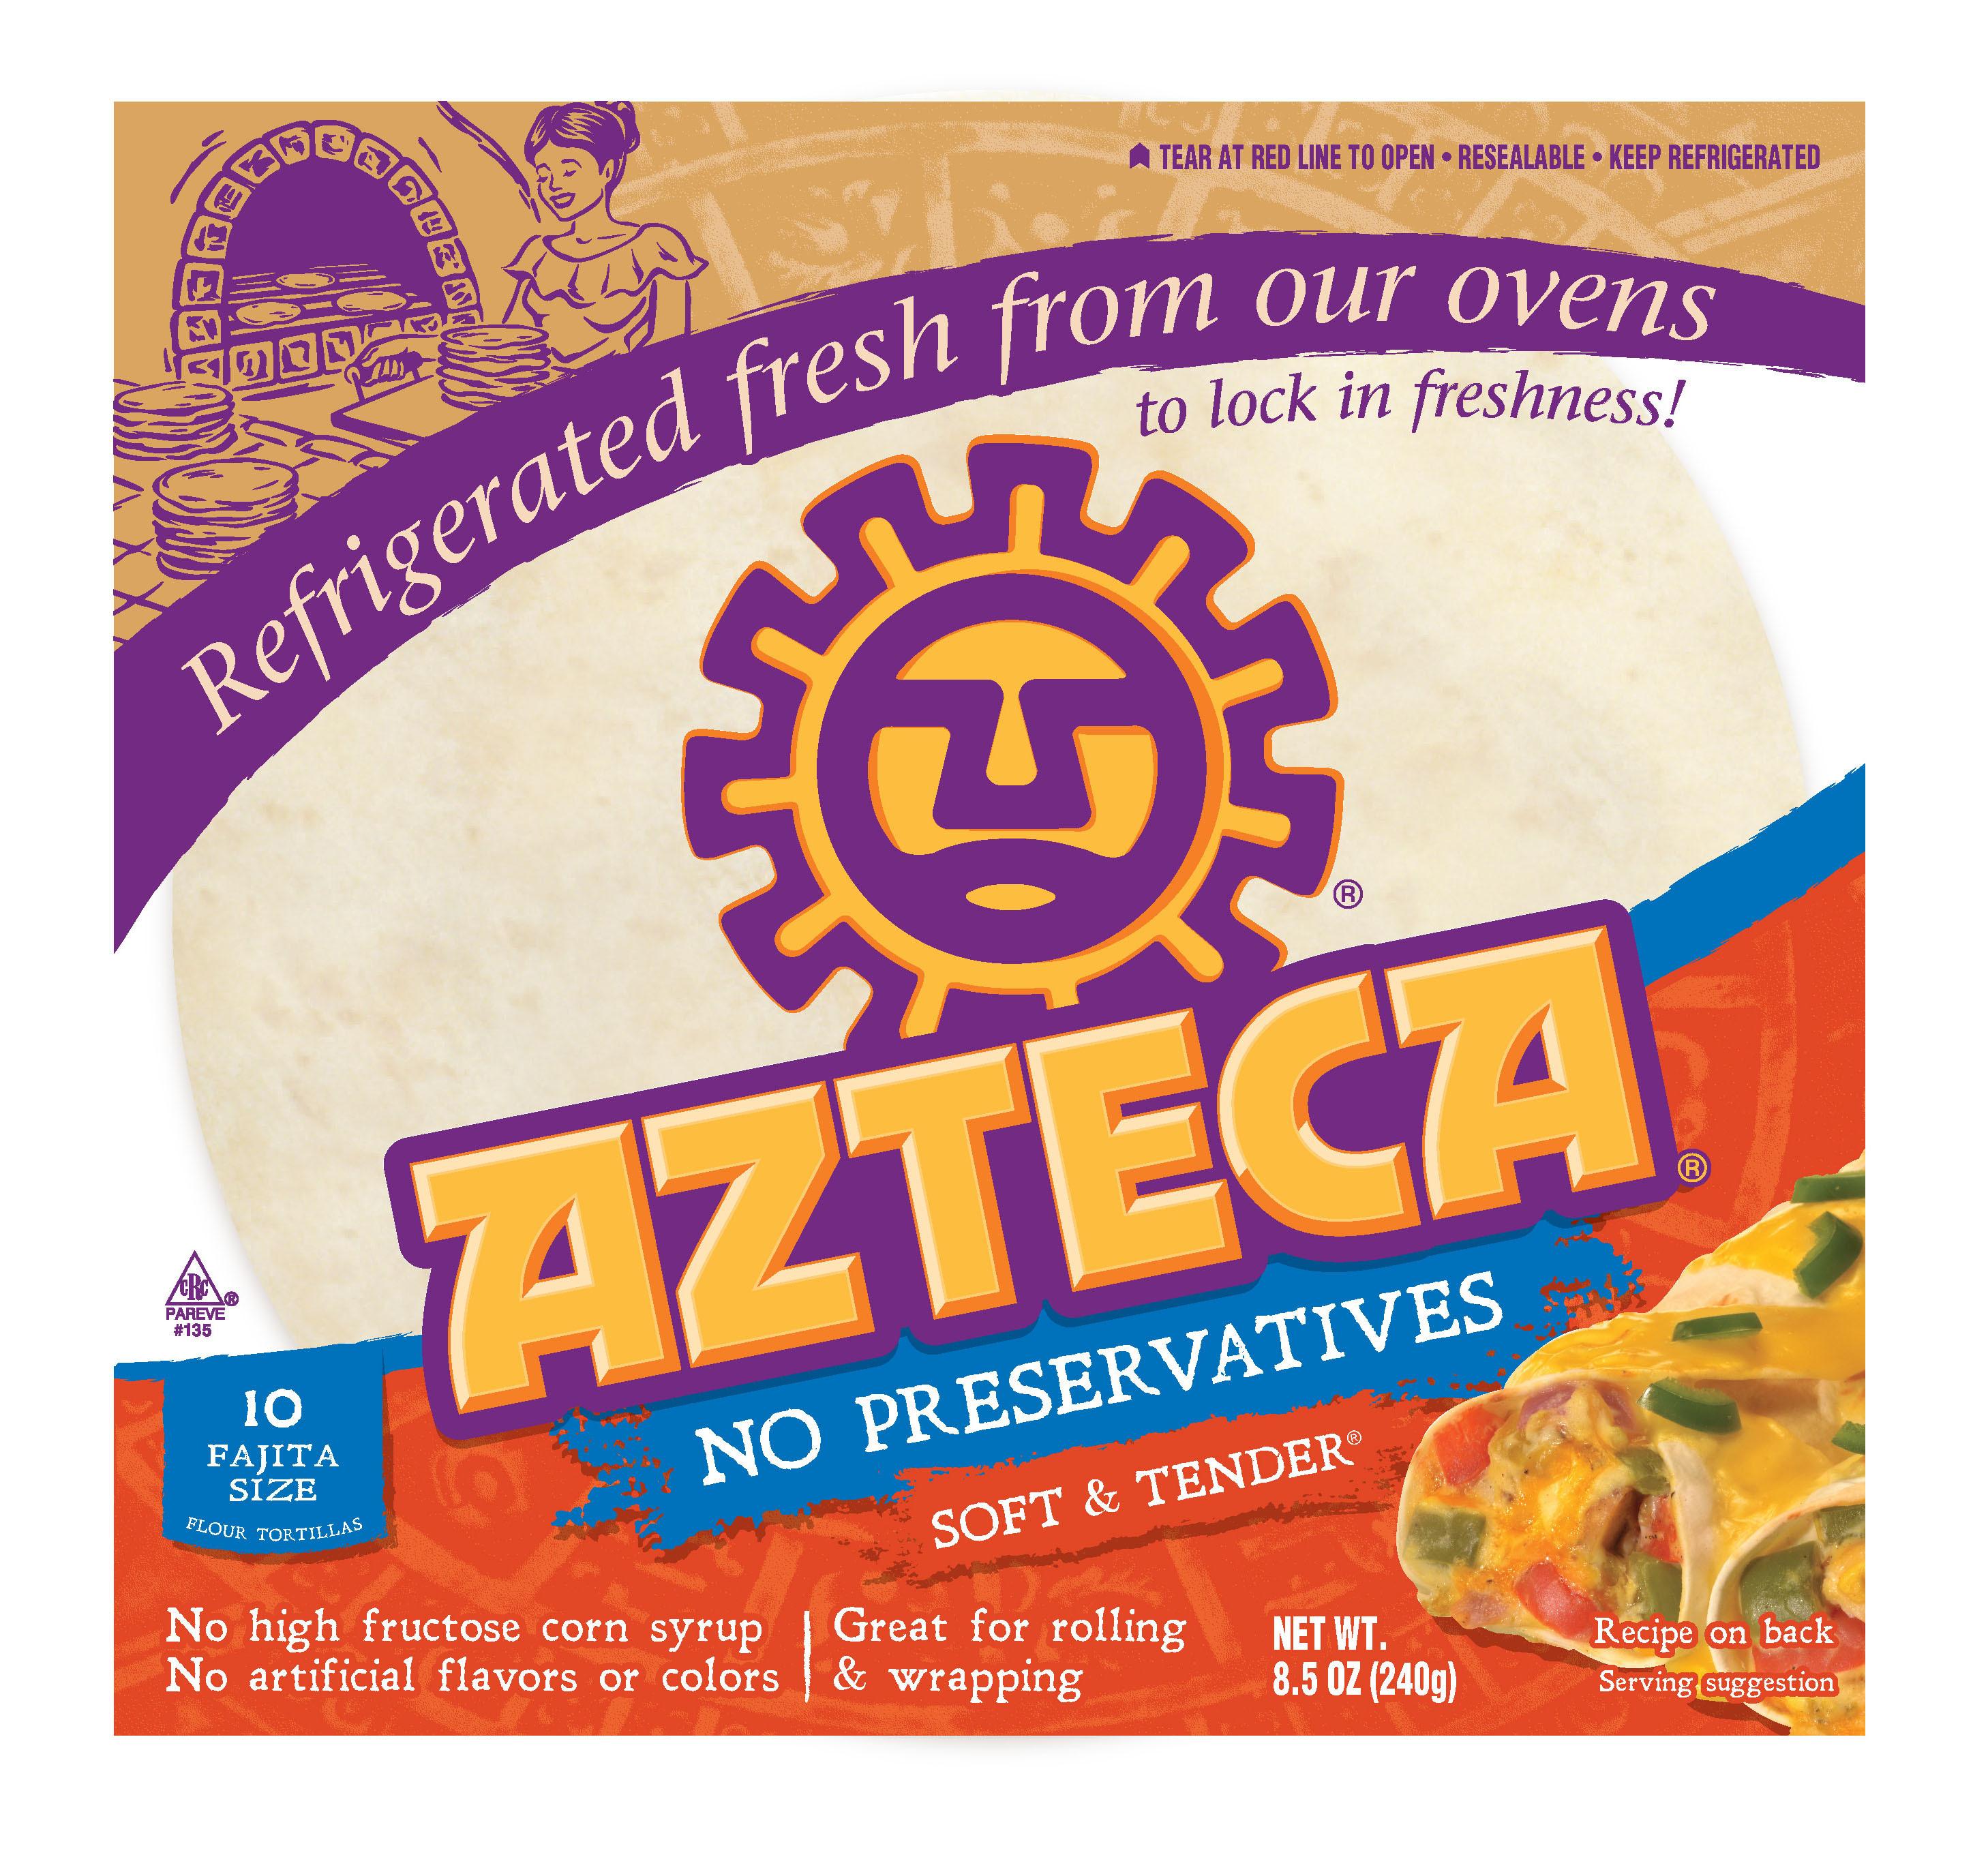 Azteca Foods Announces New Platform of Healthier Tortilla Options (Photo: Business Wire)